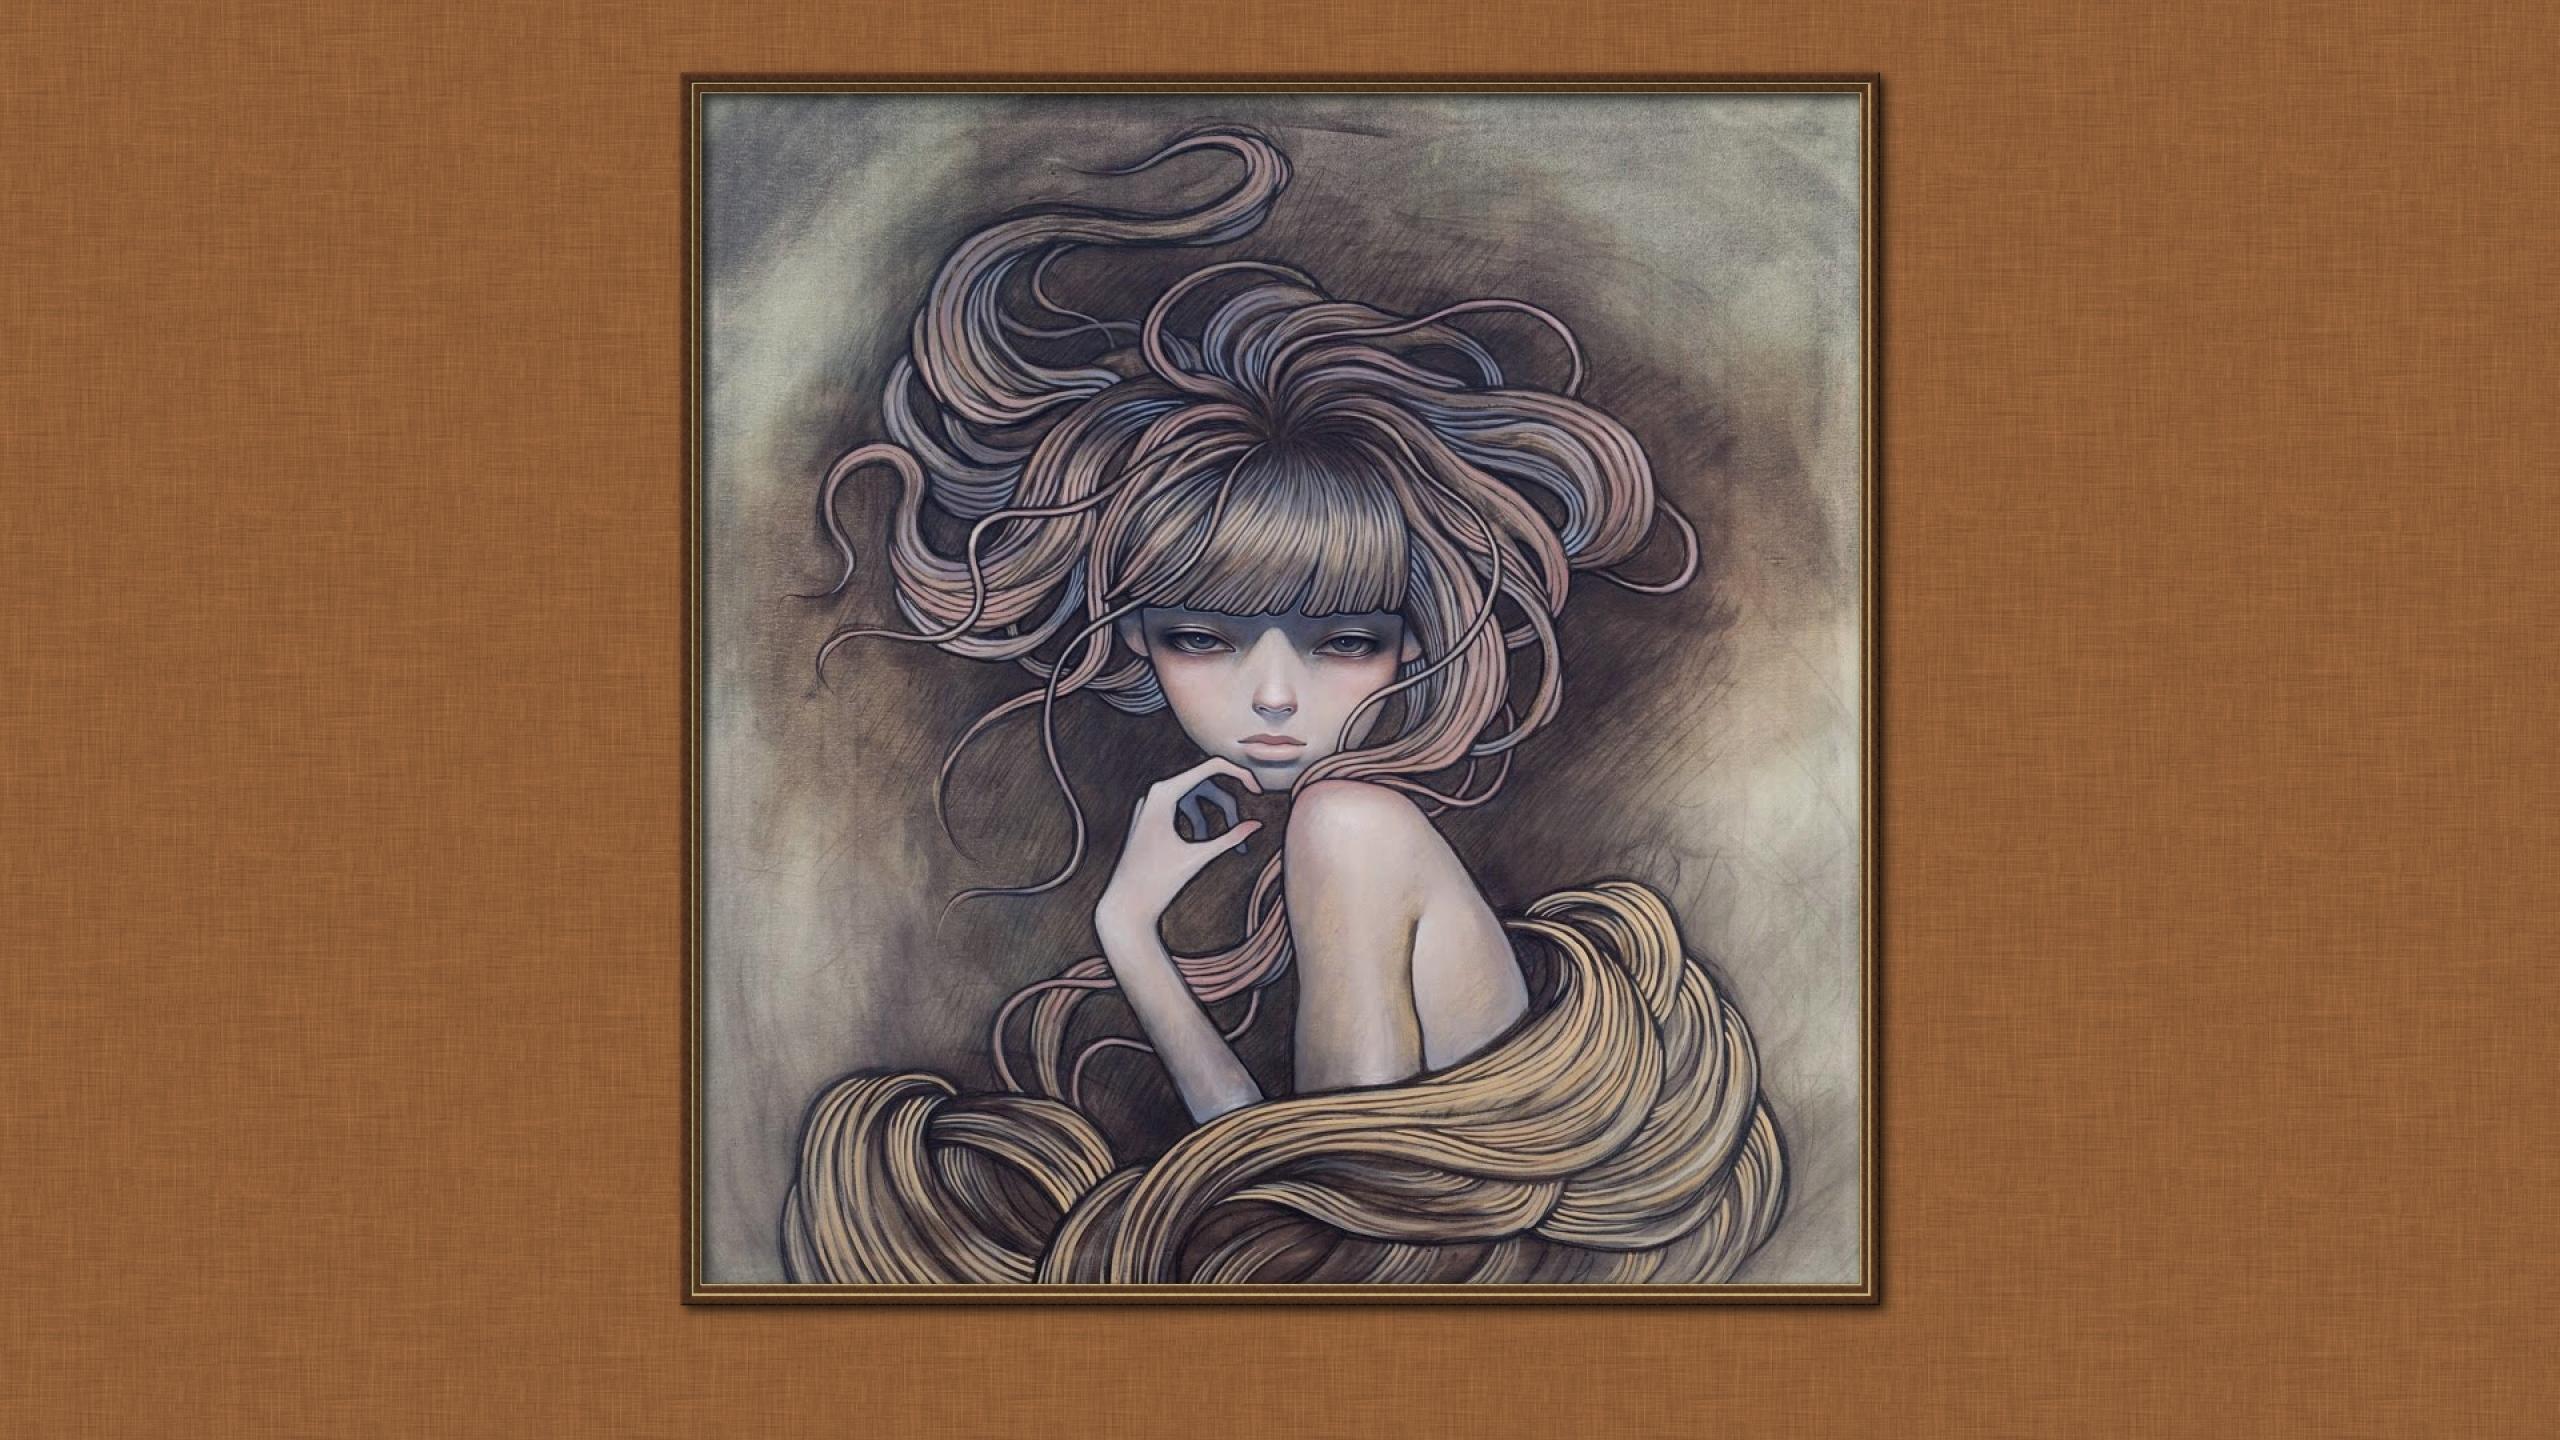 audrey kawasaki 1920x1080 wallpaper Wallpaper Wallpapers 2560x1440